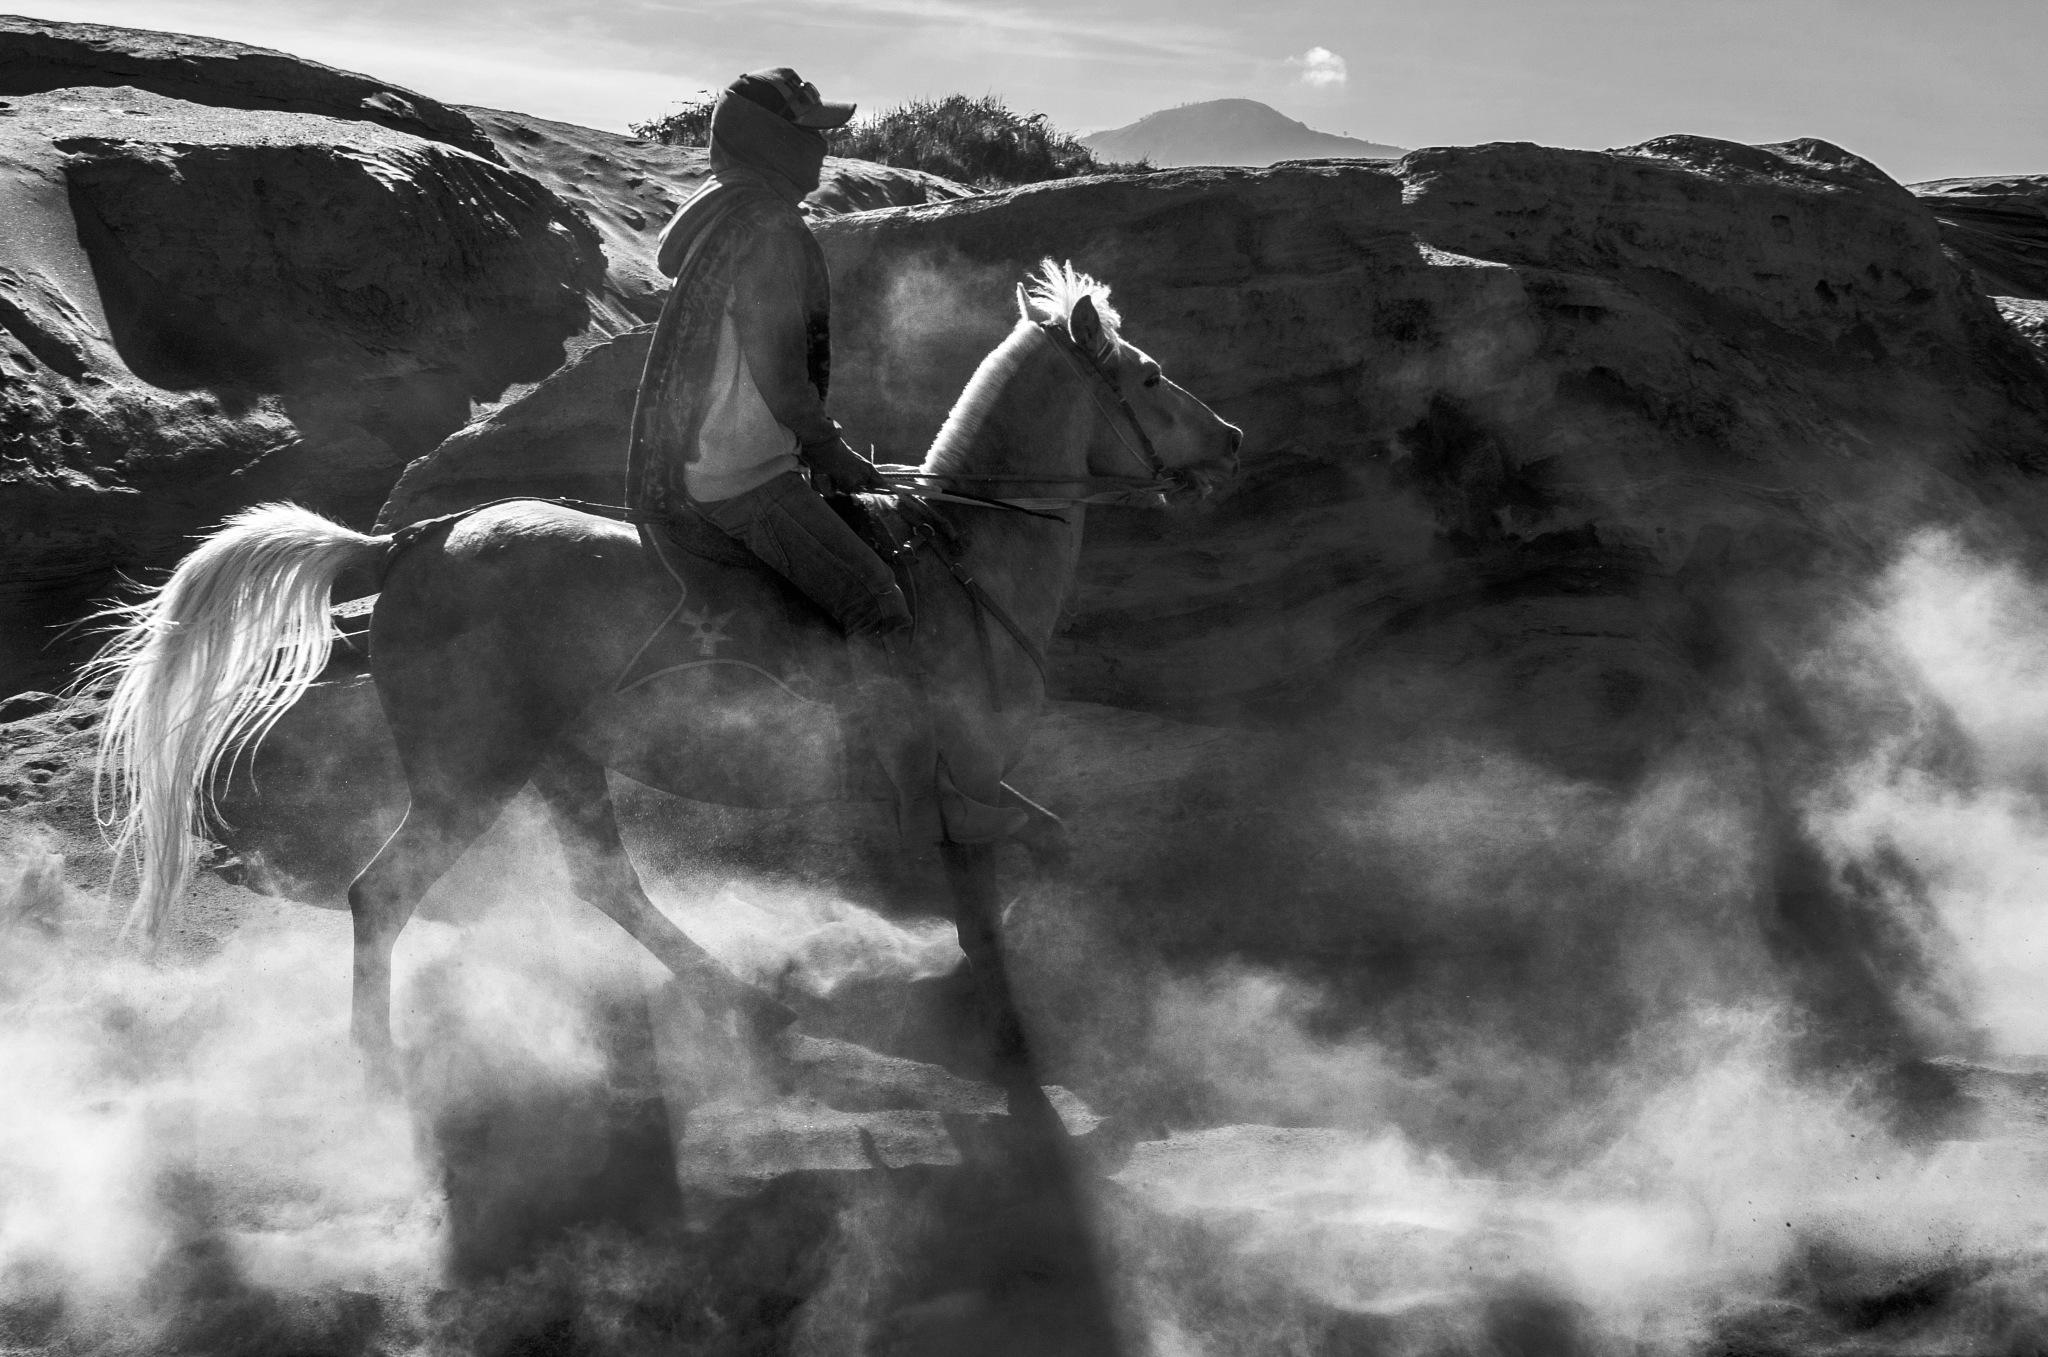 Kuda dan Debu by arthamade